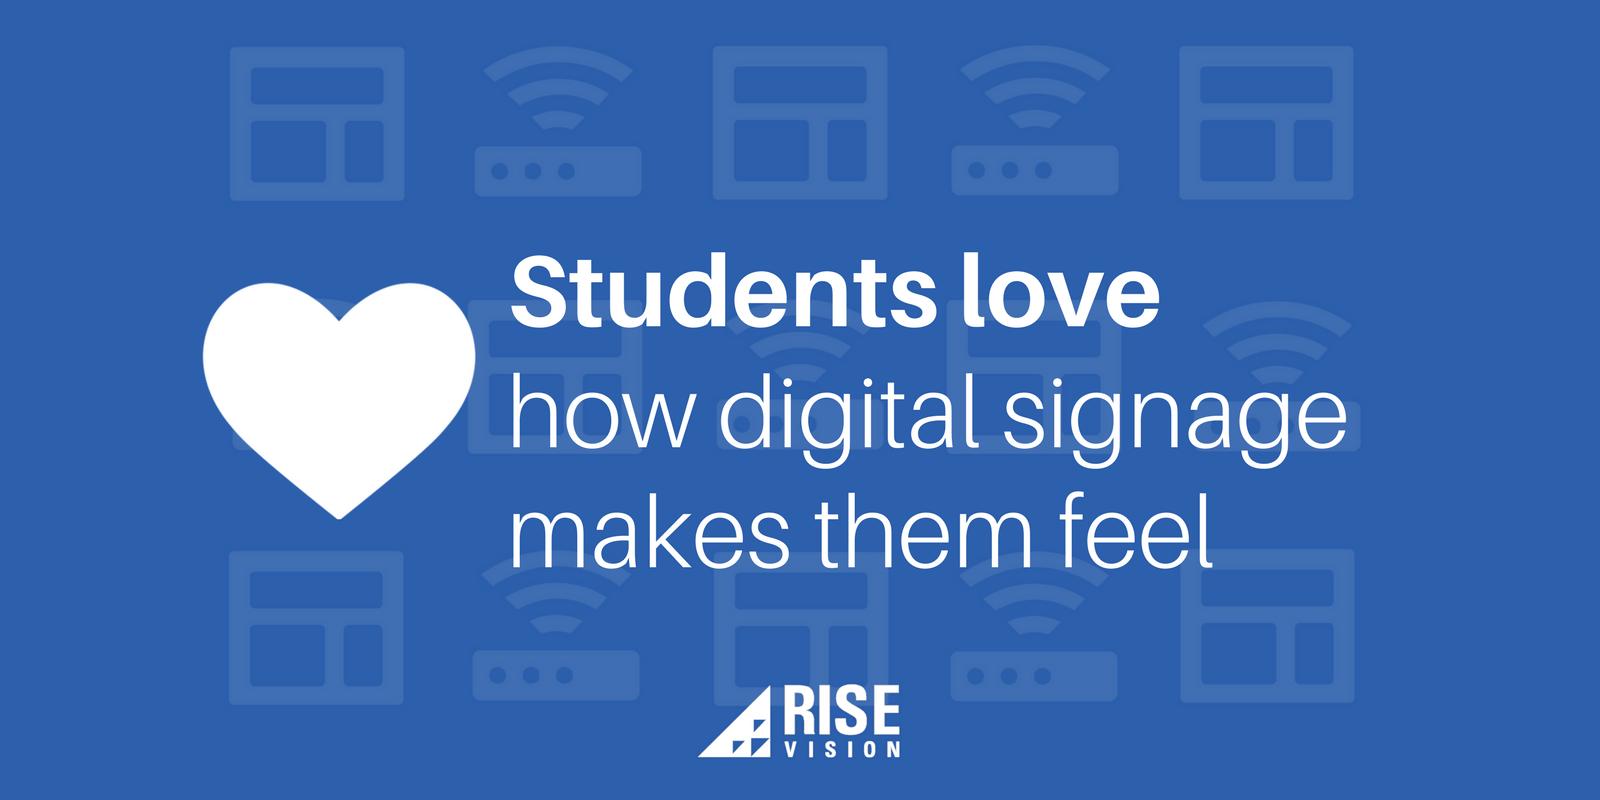 Rise Vision Digital Signage Education Students Love.png